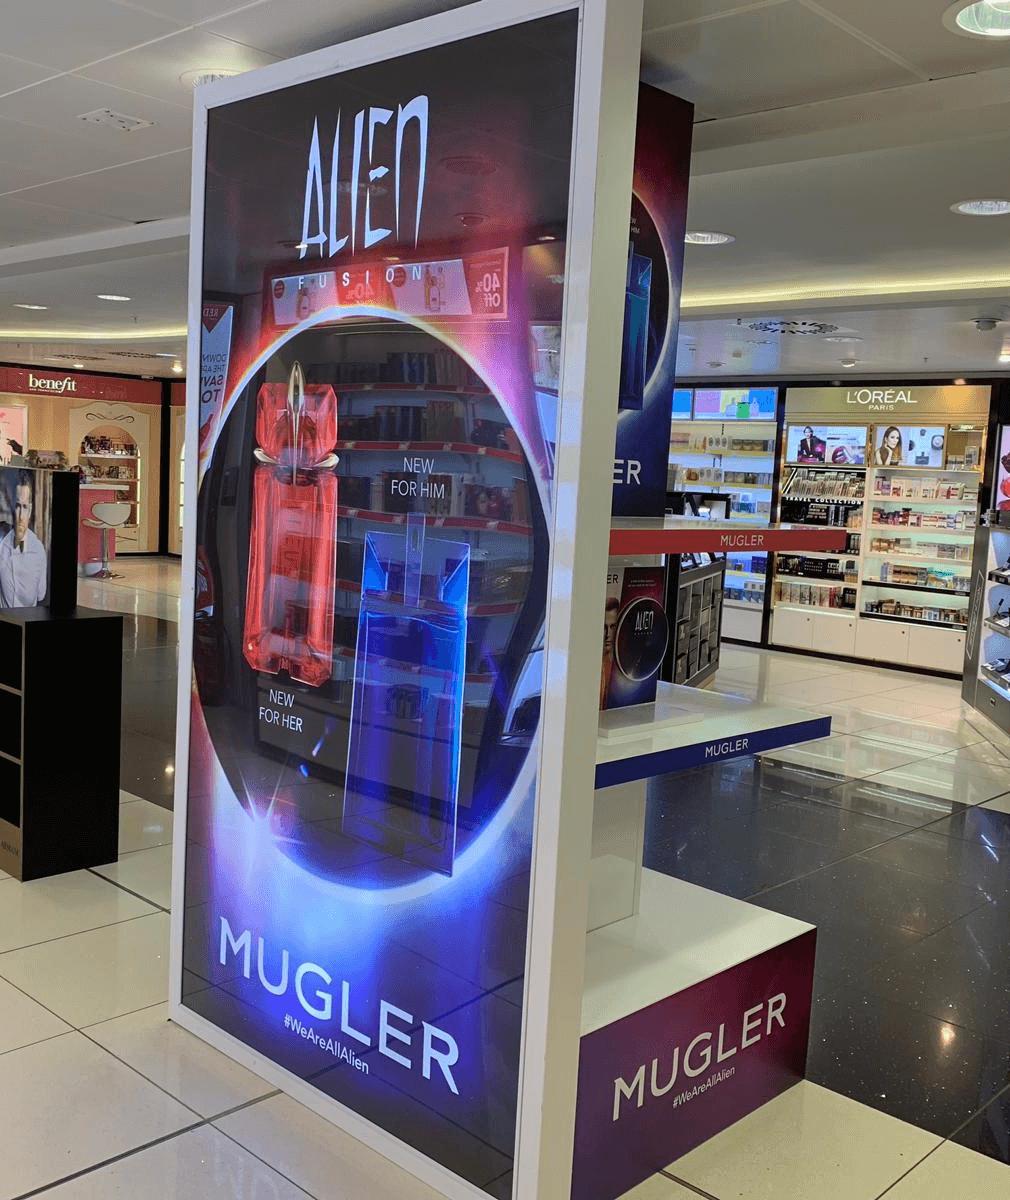 Mugler Alien Fusion Perfume Display